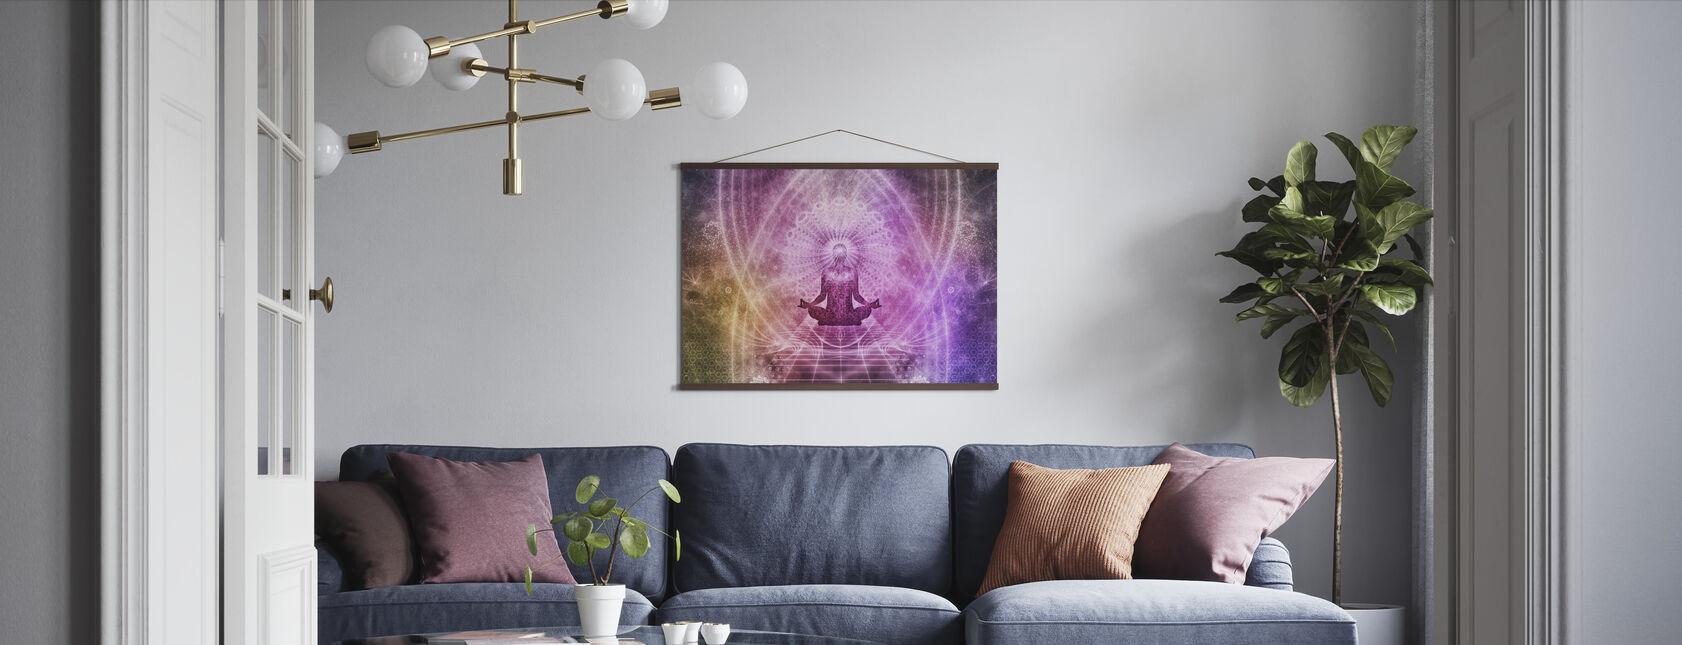 Andlig Meditation - Poster - Vardagsrum